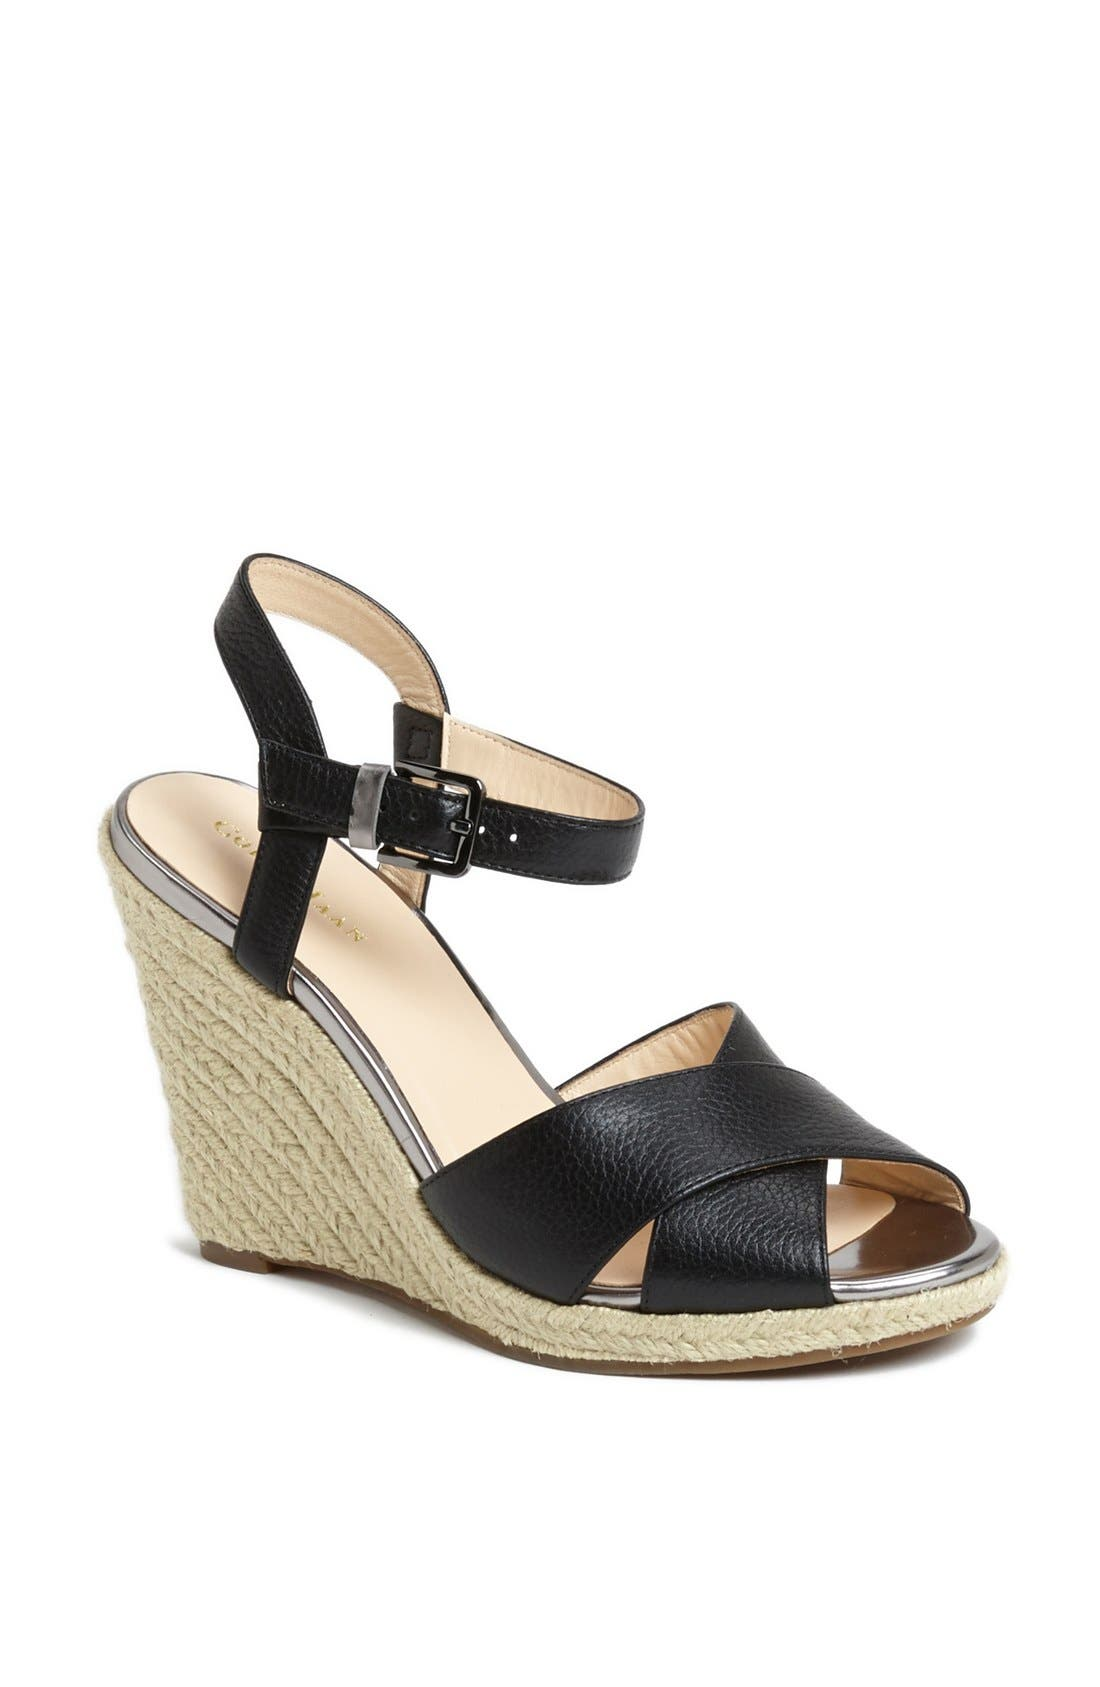 Alternate Image 1 Selected - Cole Haan 'Hart' Wedge Platform Sandal